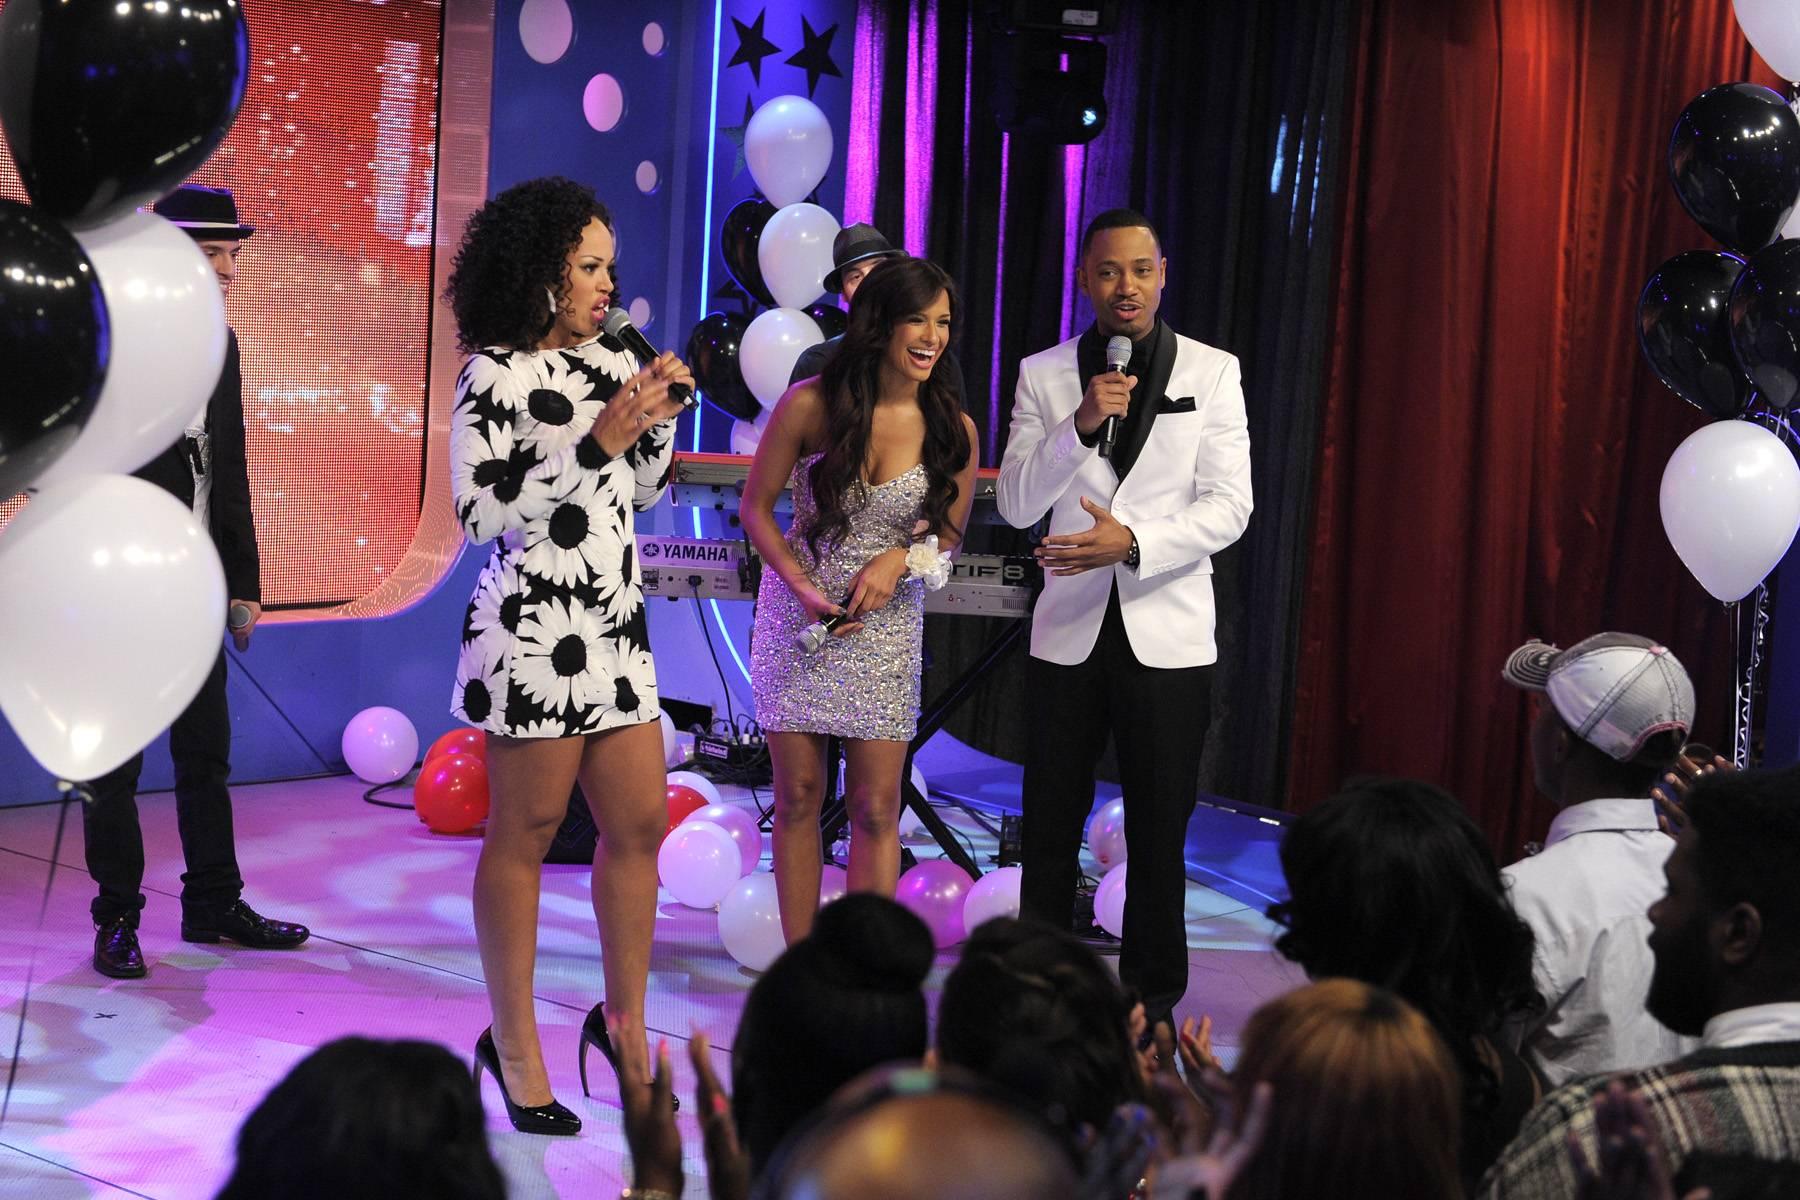 Grand Finale? - Elle Varner with Rocsi Diaz and Terrence J at 106 & Park, May 25, 2012. (Photo: John Ricard / BET)